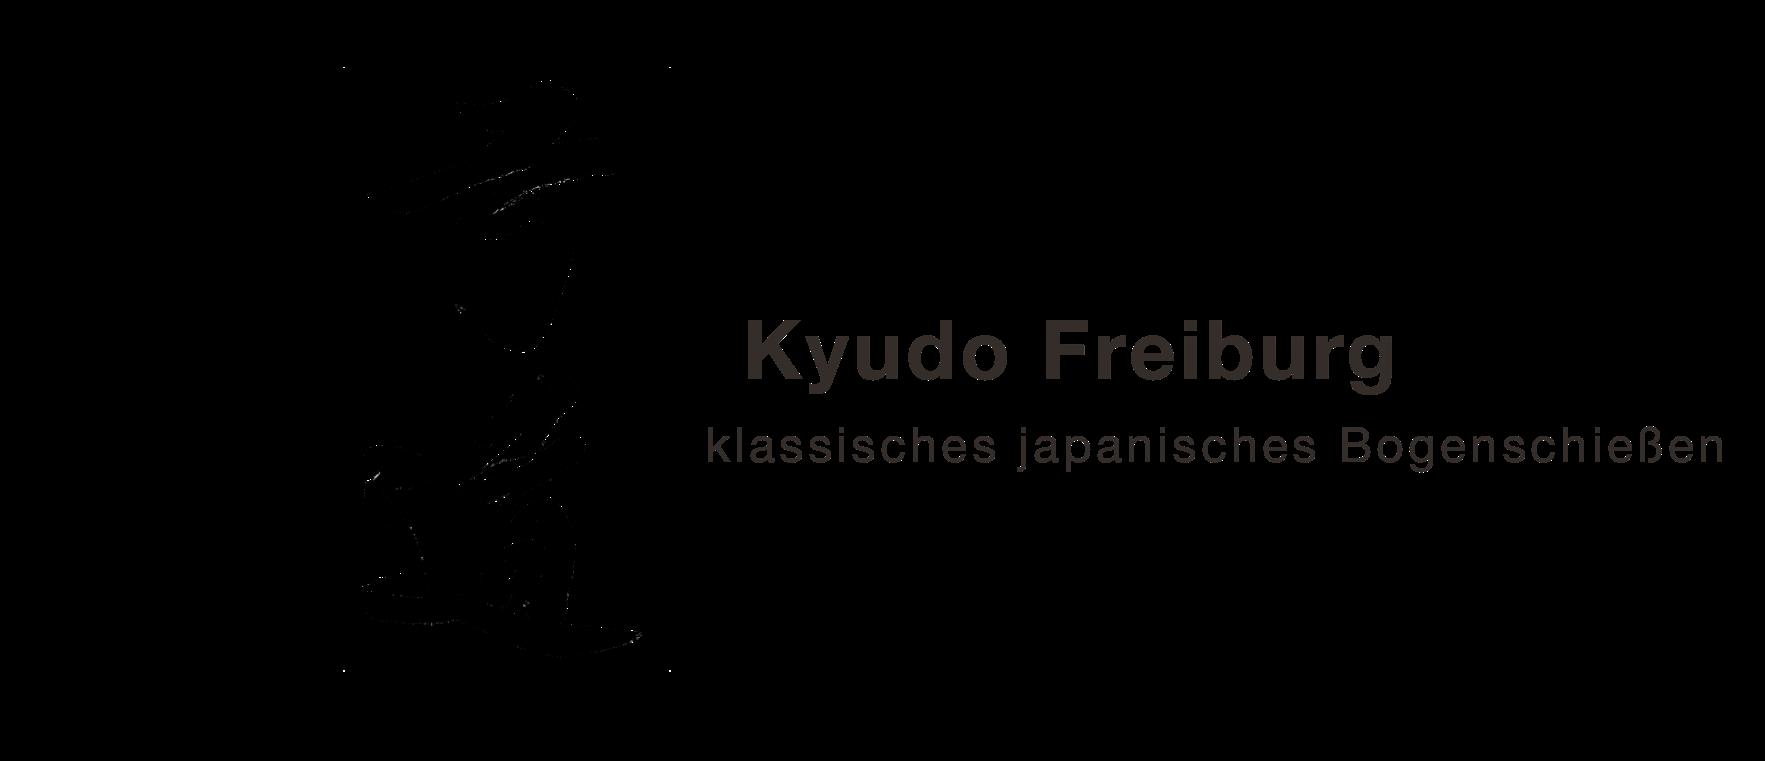 Kyudo Freiburg